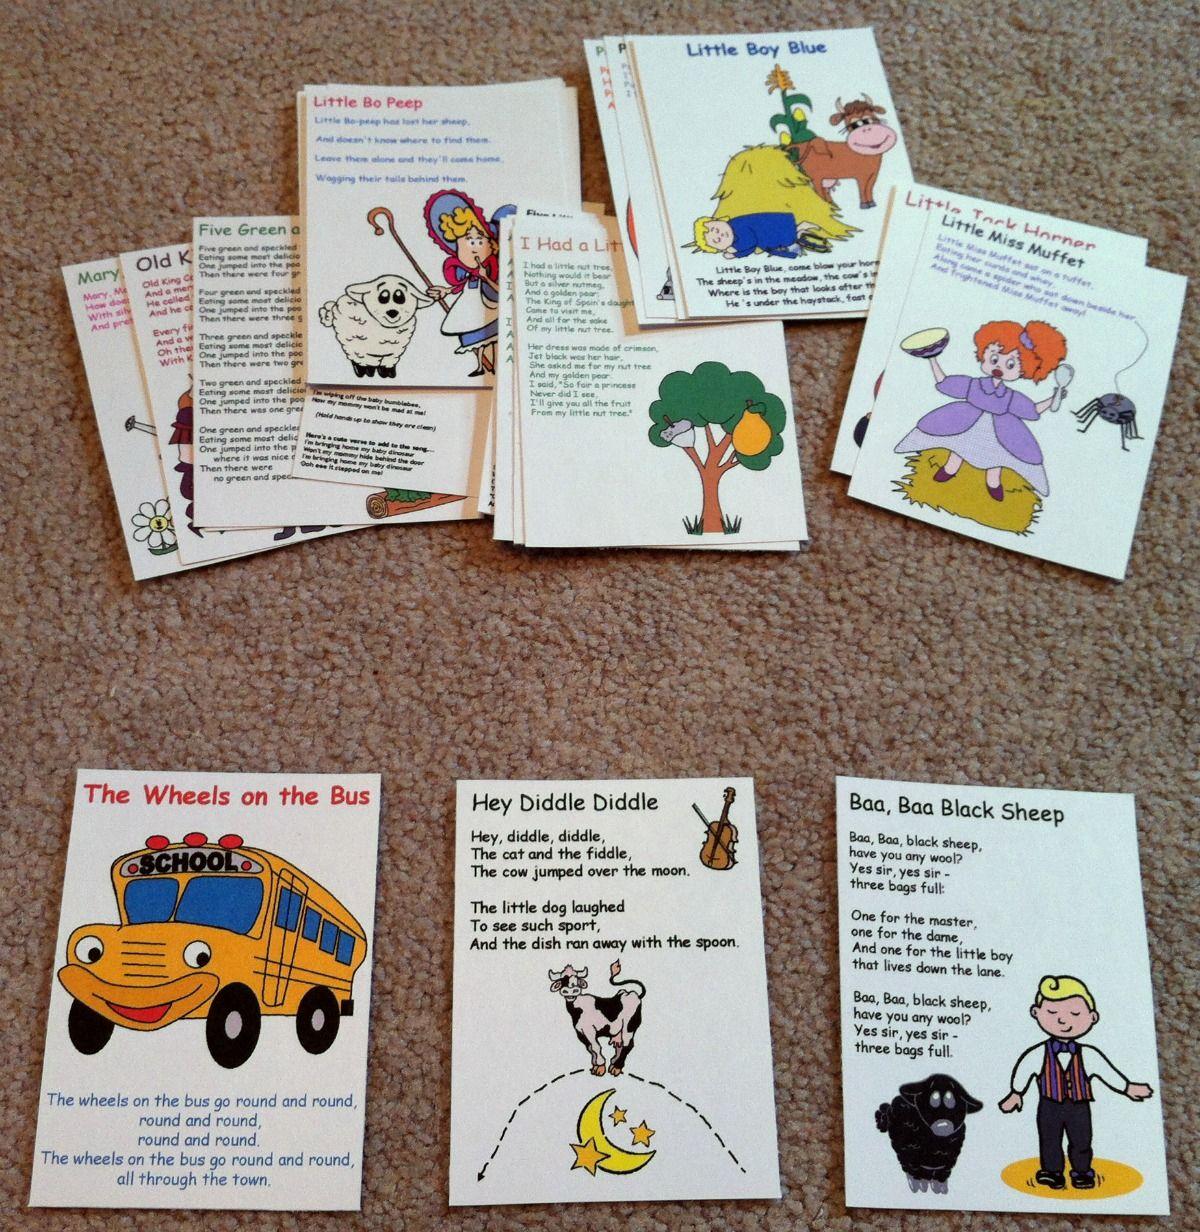 Busy Bag Nursery Rhymes And Songs Flashcards 1 200 1 232 Pixels